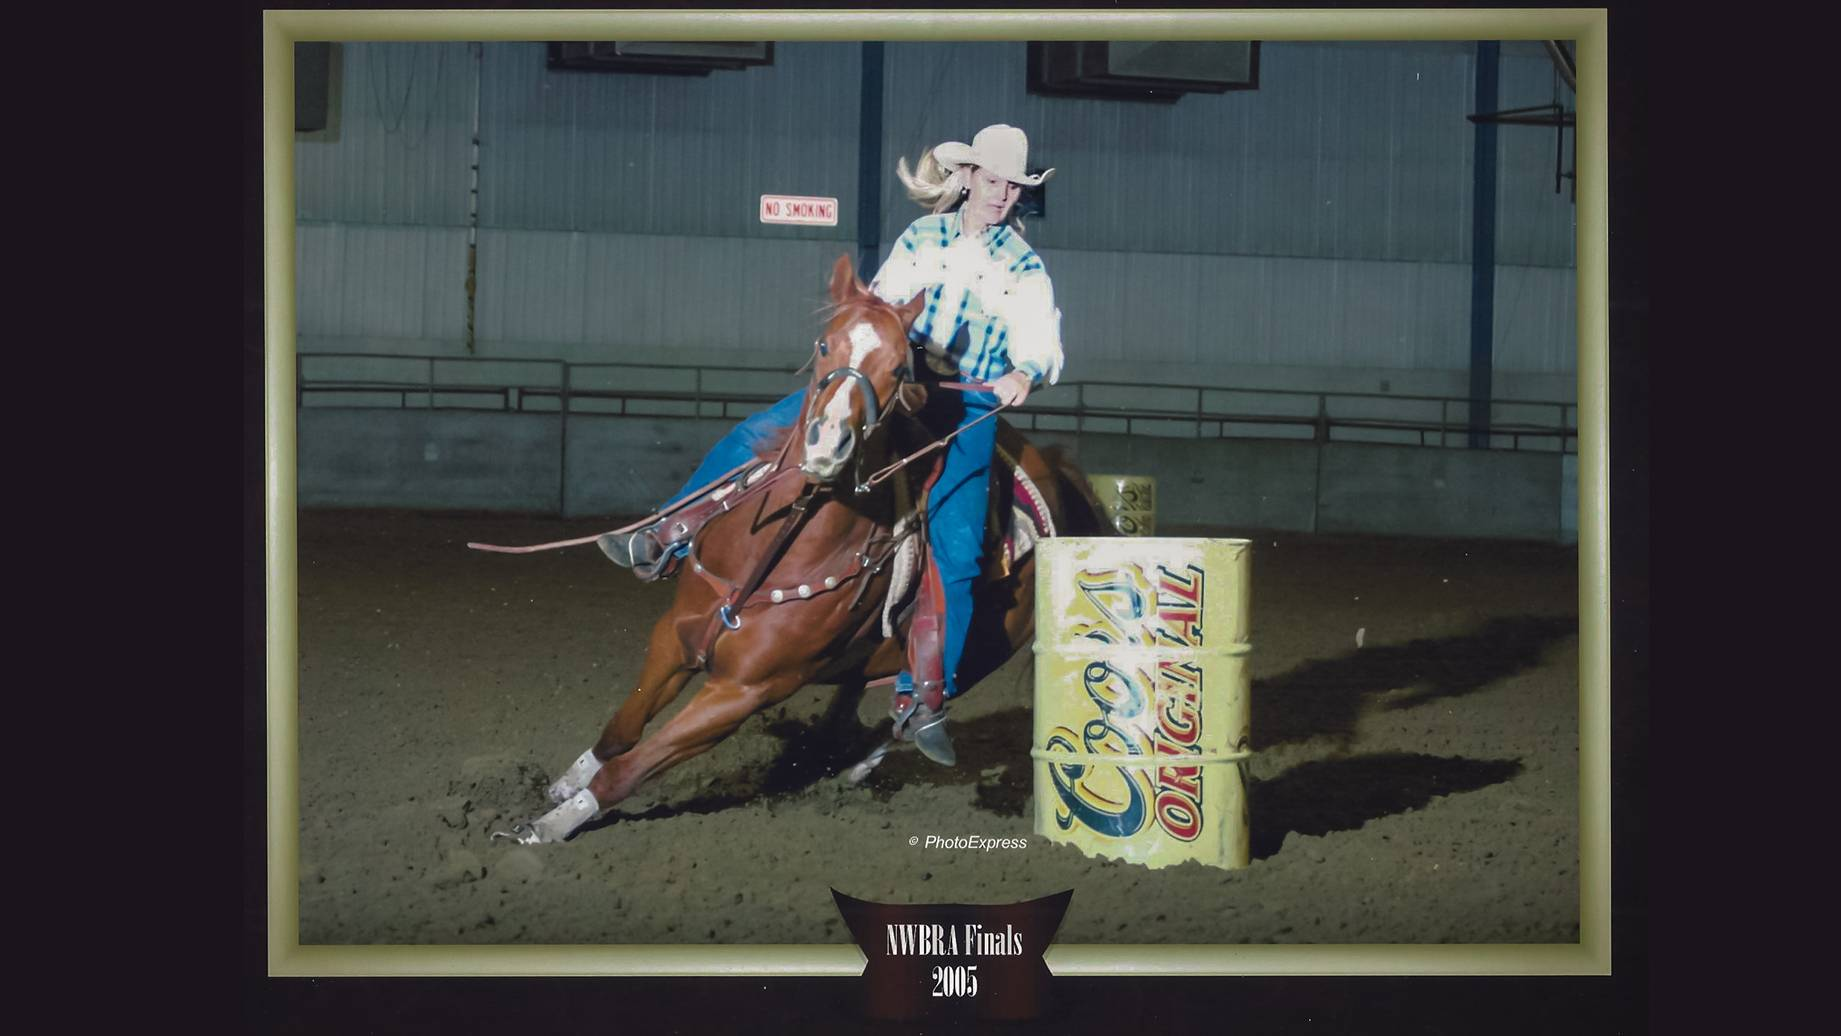 2005 photo of barrel racer Terri Kissack